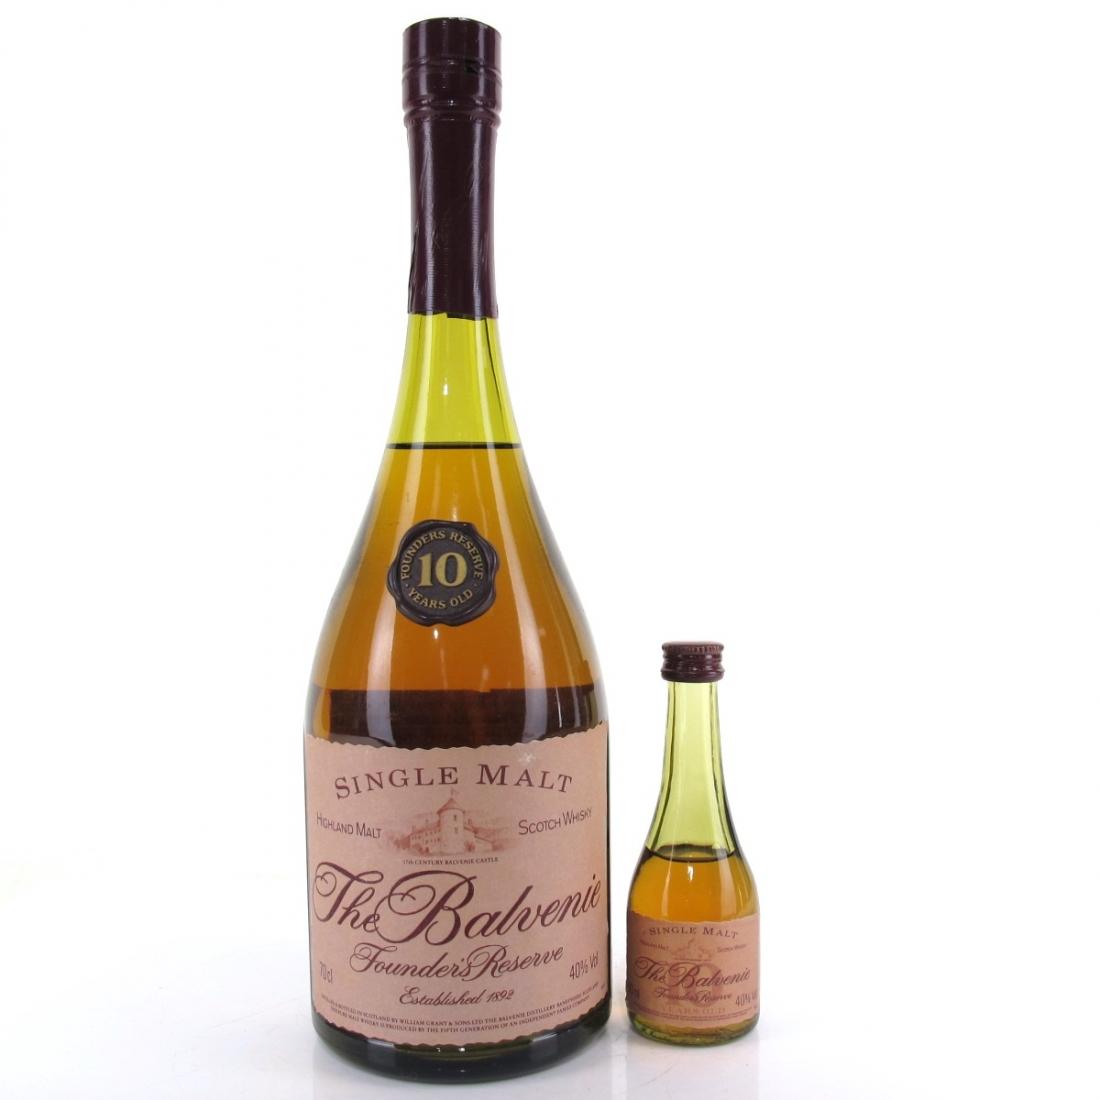 Balvenie 10 Year Old Founder's Cognac Bottle / Including Miniature